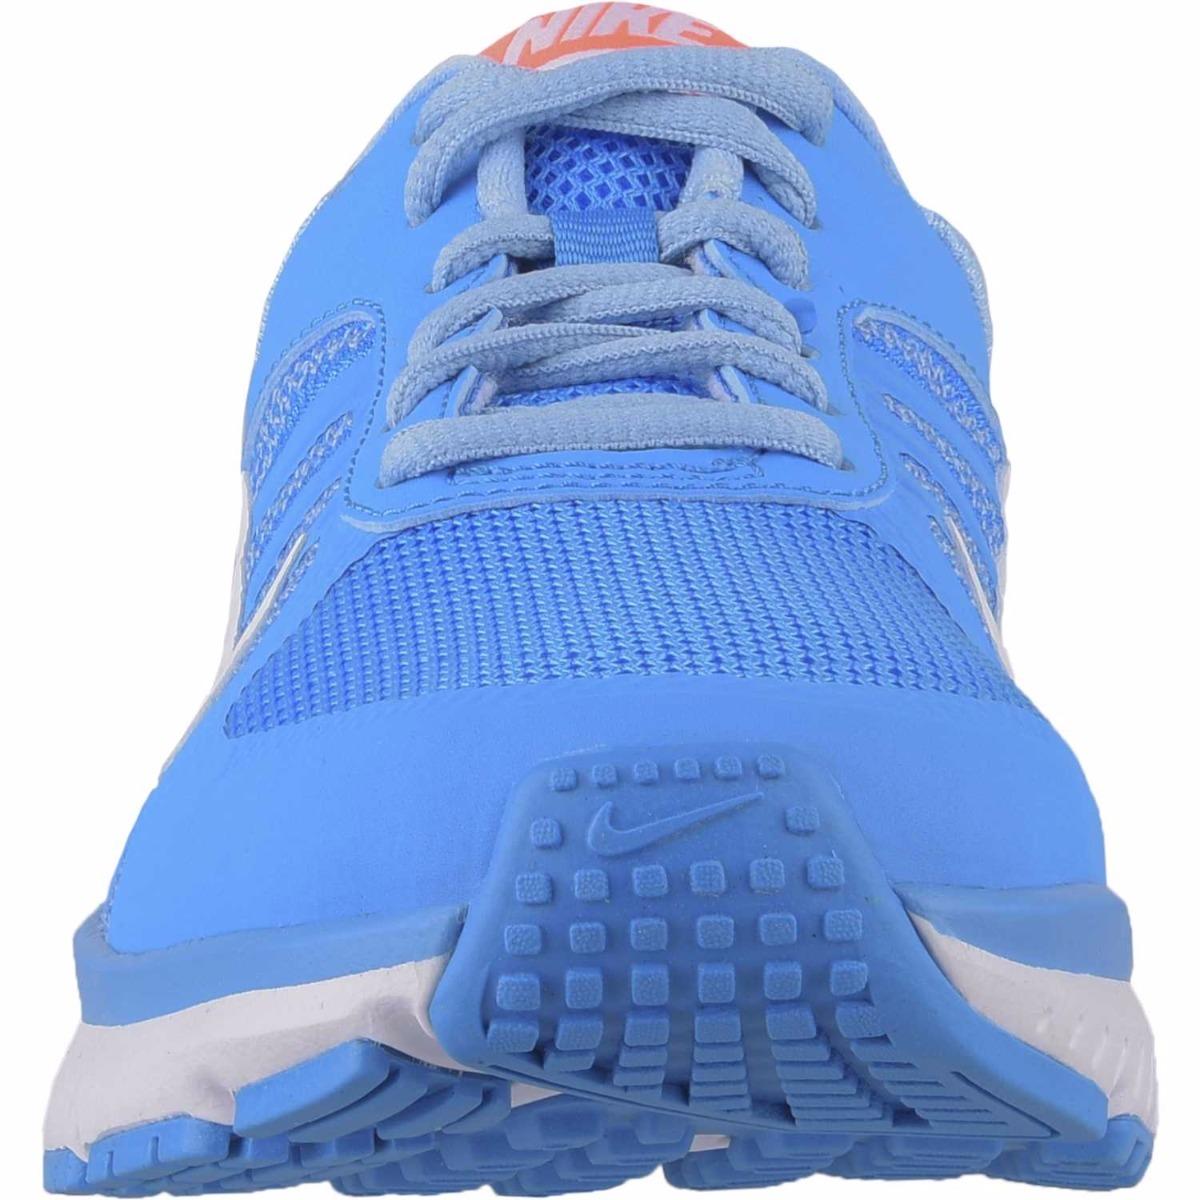 gratis 12 running msl zoom envió mujer zapatillas mujer nike Cargando zapatillas dart running nike dama wxEqC8RE